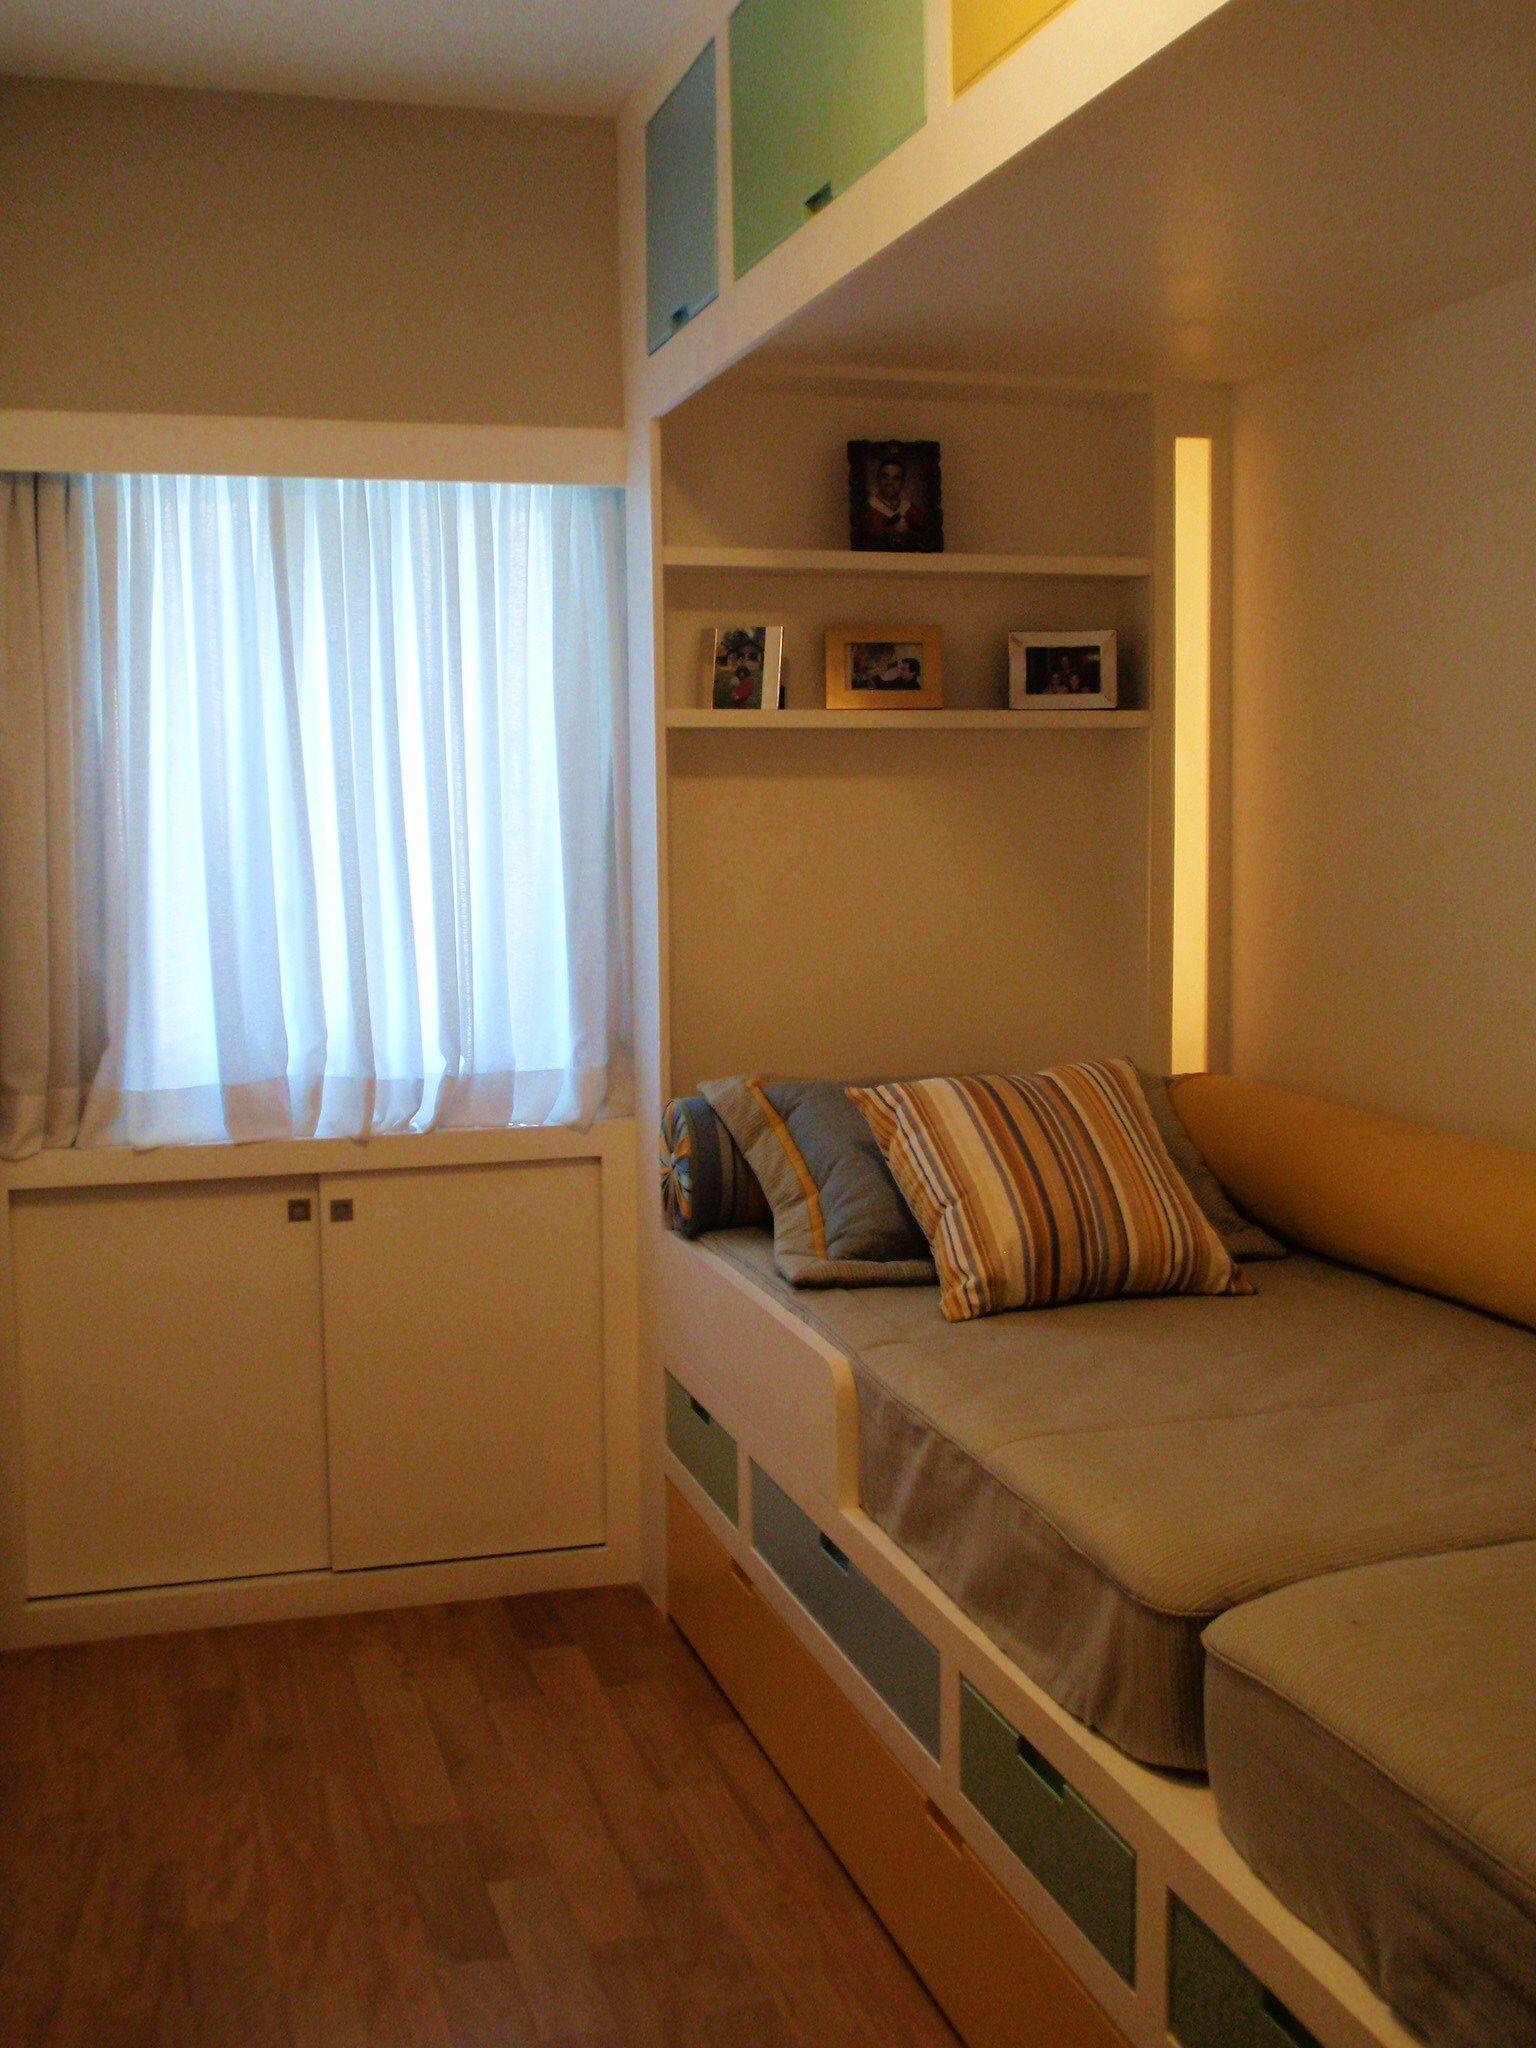 Op o quarto pequeno room pinterest studentenzimmer for Wohnideen studentenzimmer